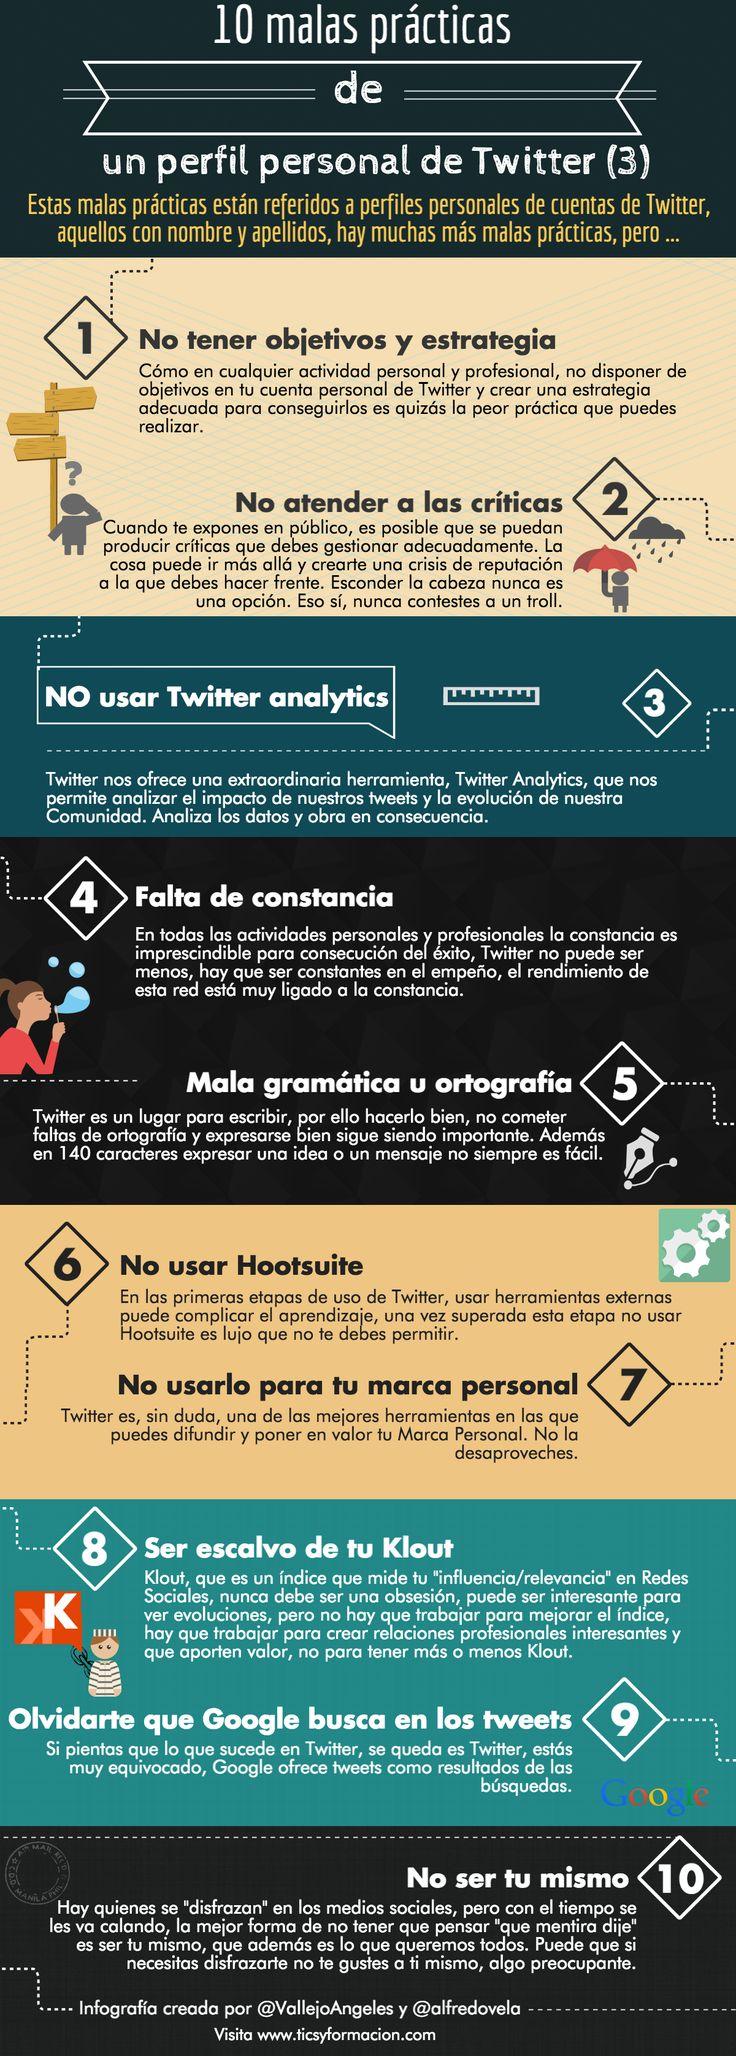 10 malas prácticas de un perfil personal de Twitter (III). #Infografía